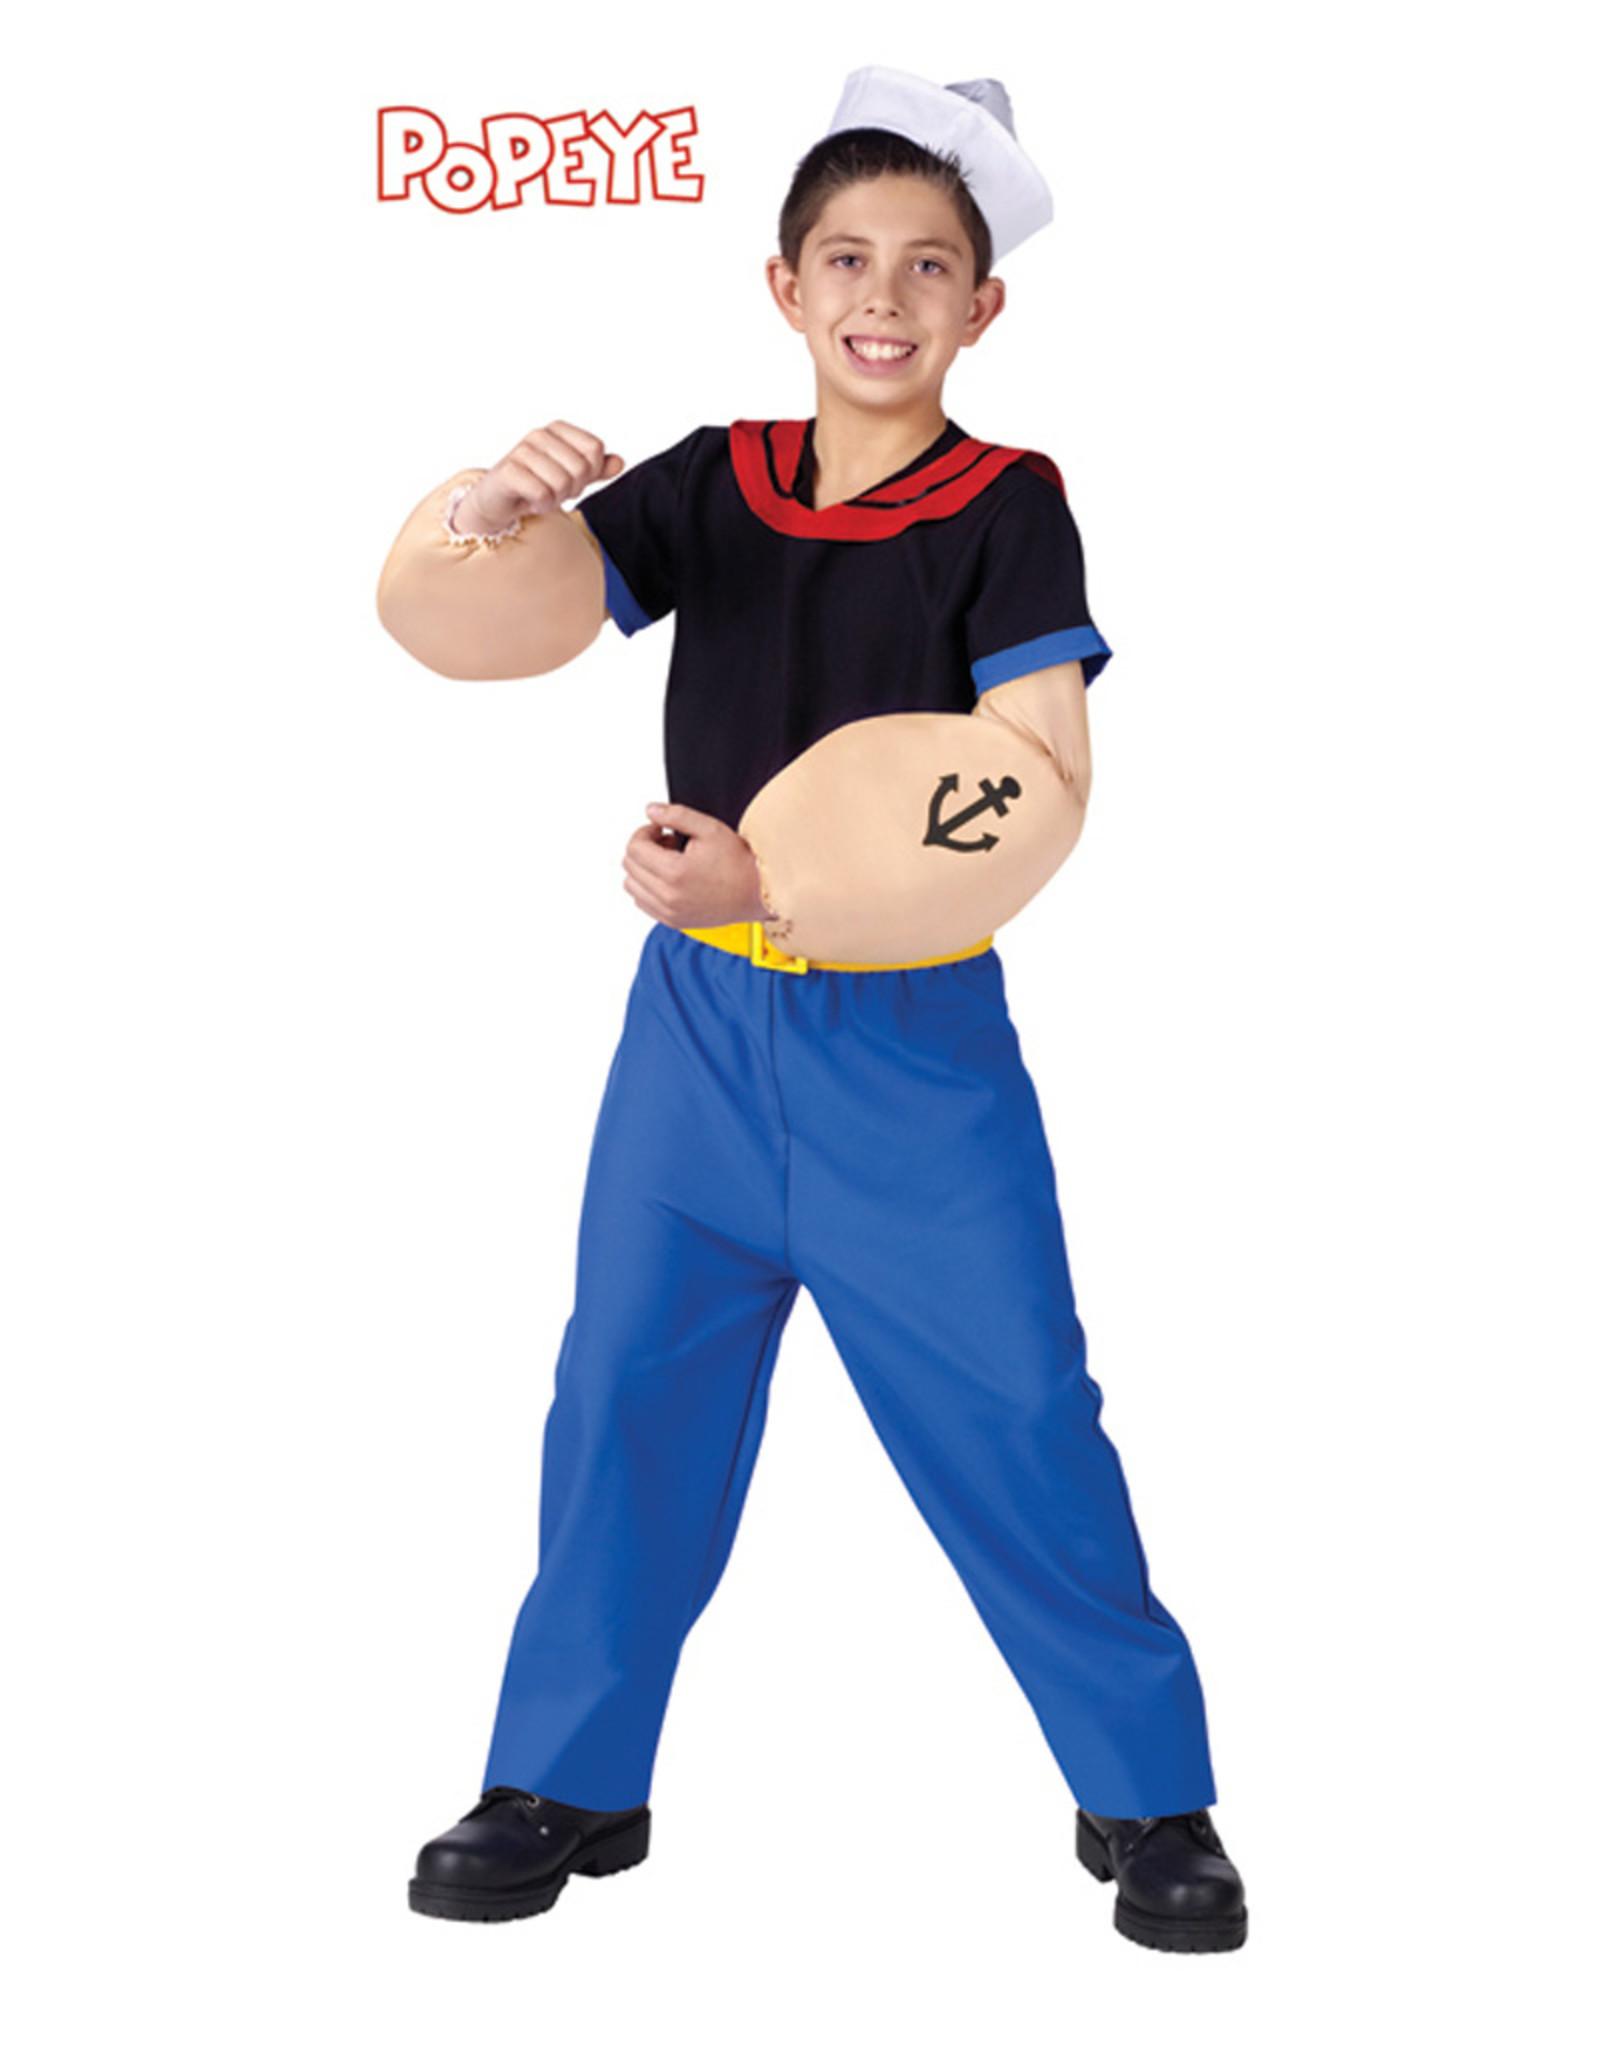 Popeye Costume - Boys